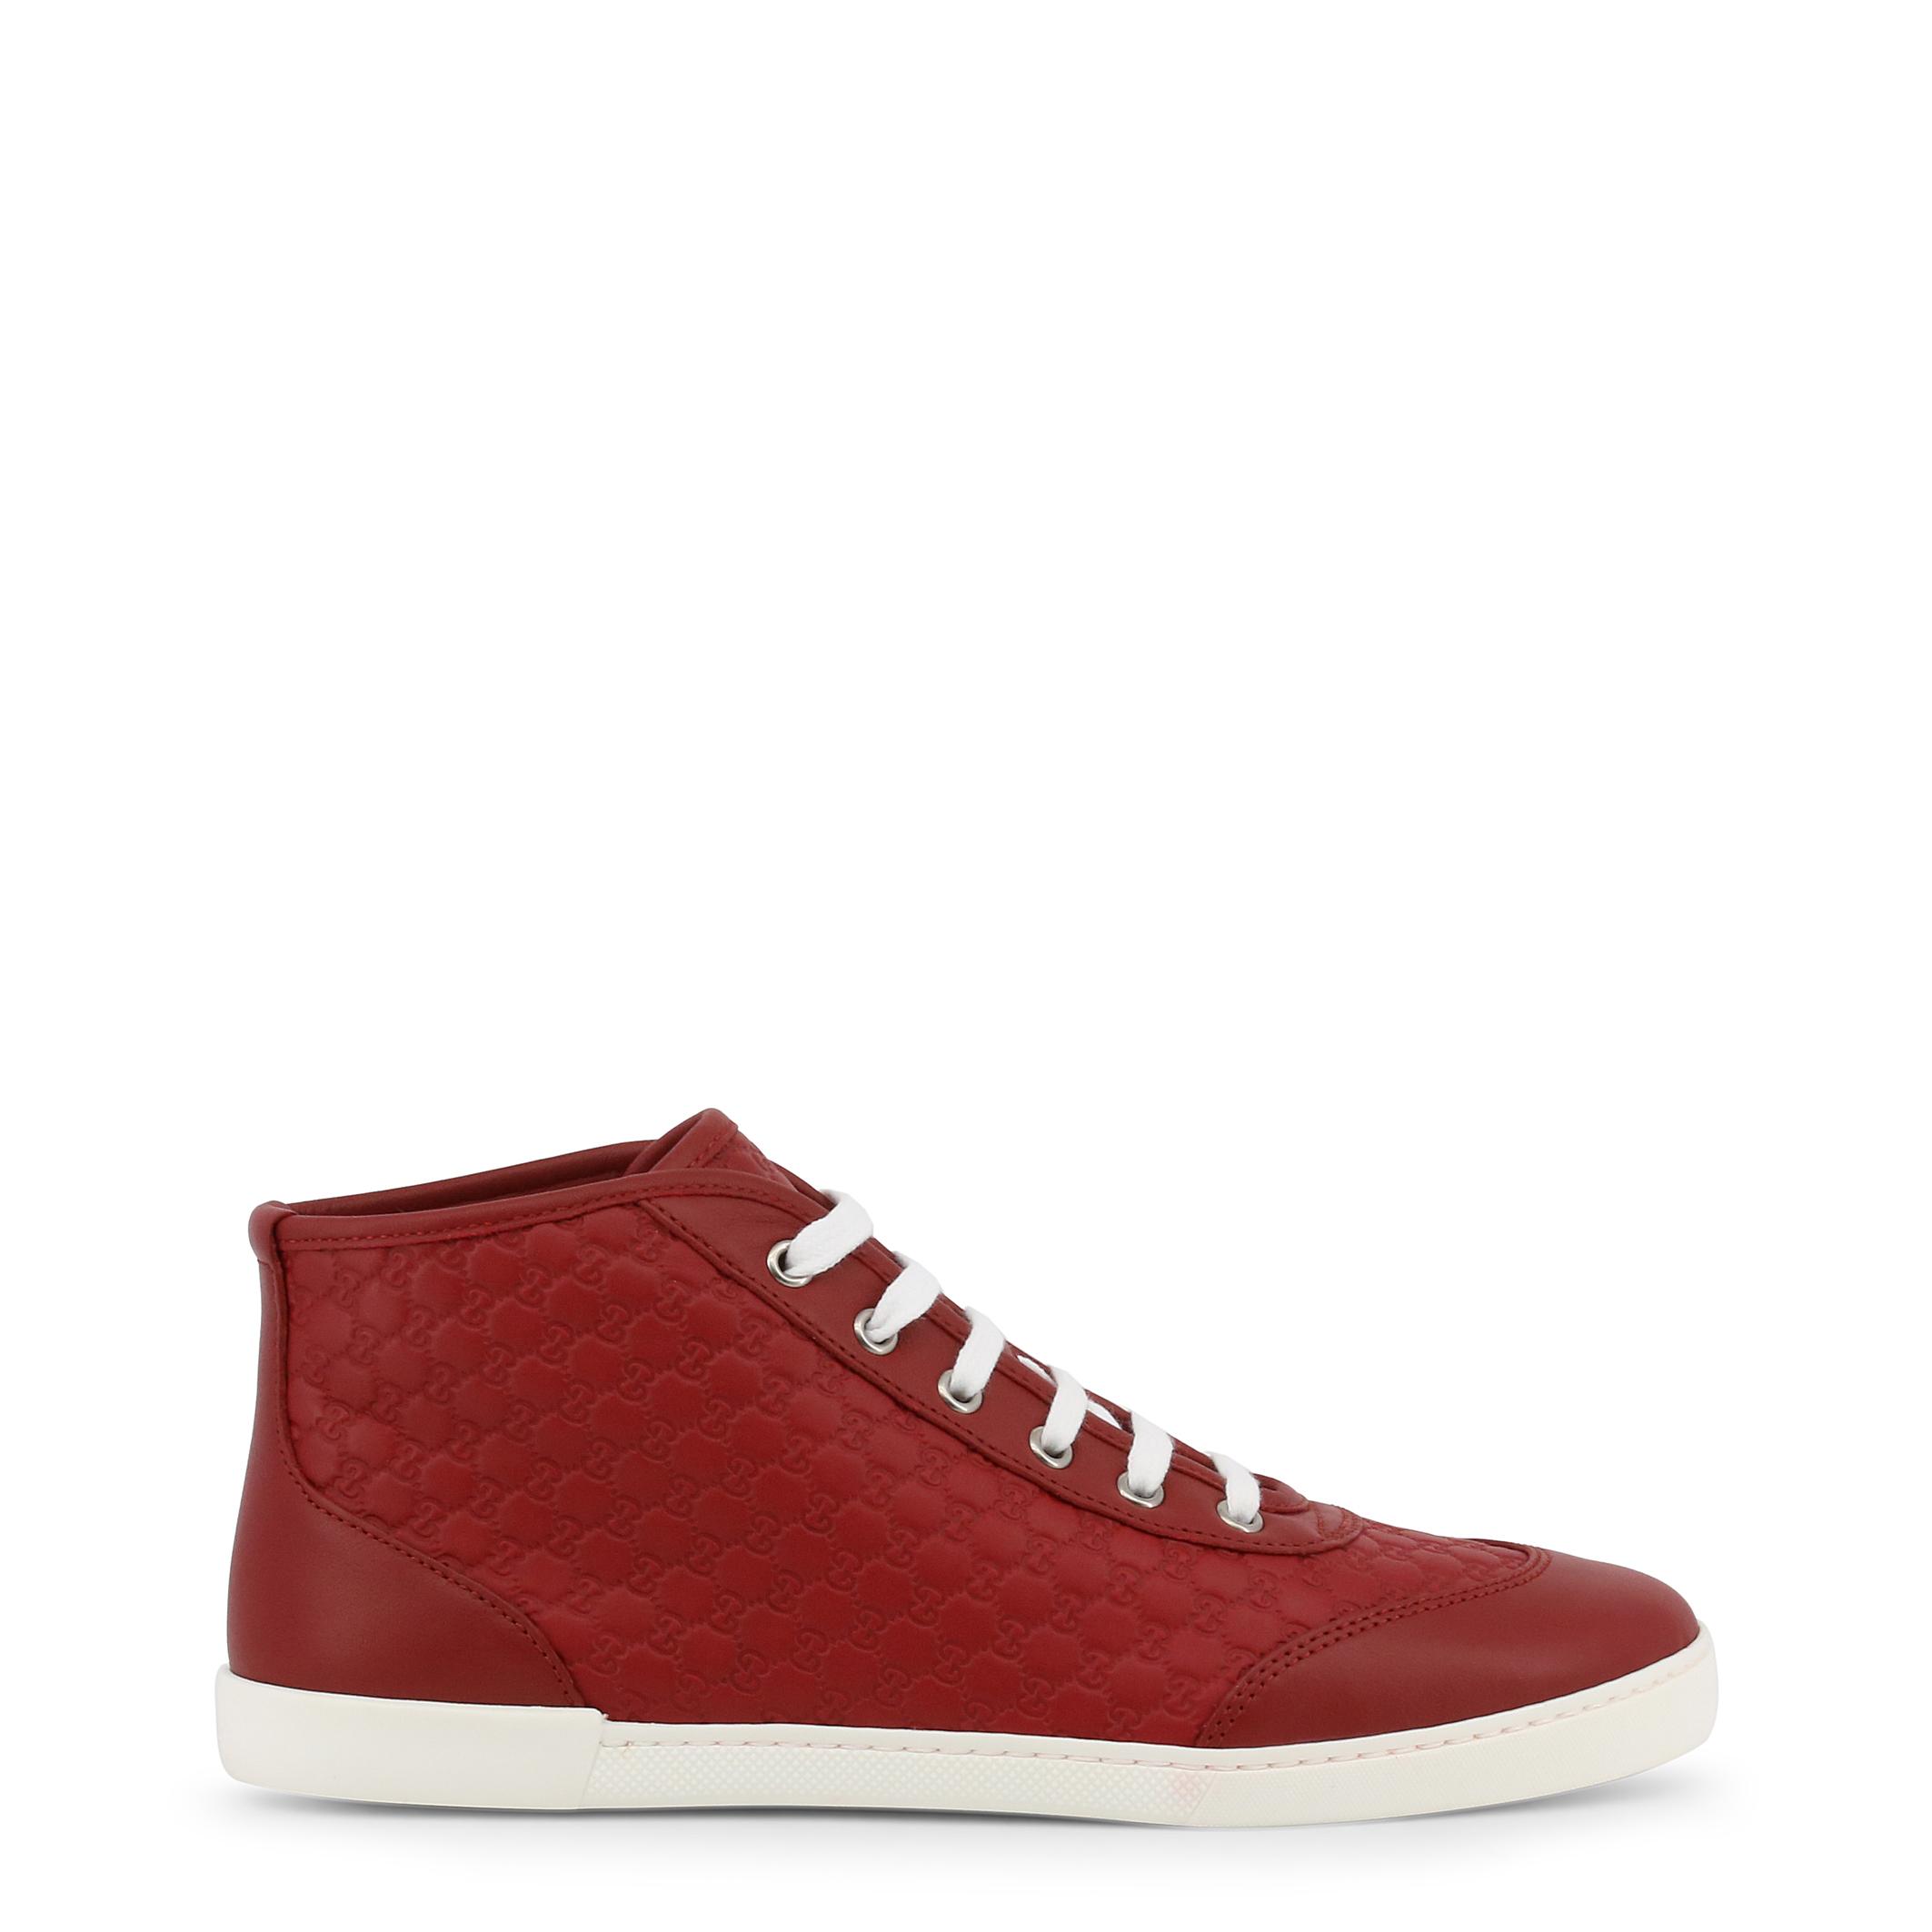 Sneakers-Gucci-391499-A9LF0-Donna-Rosso-100173